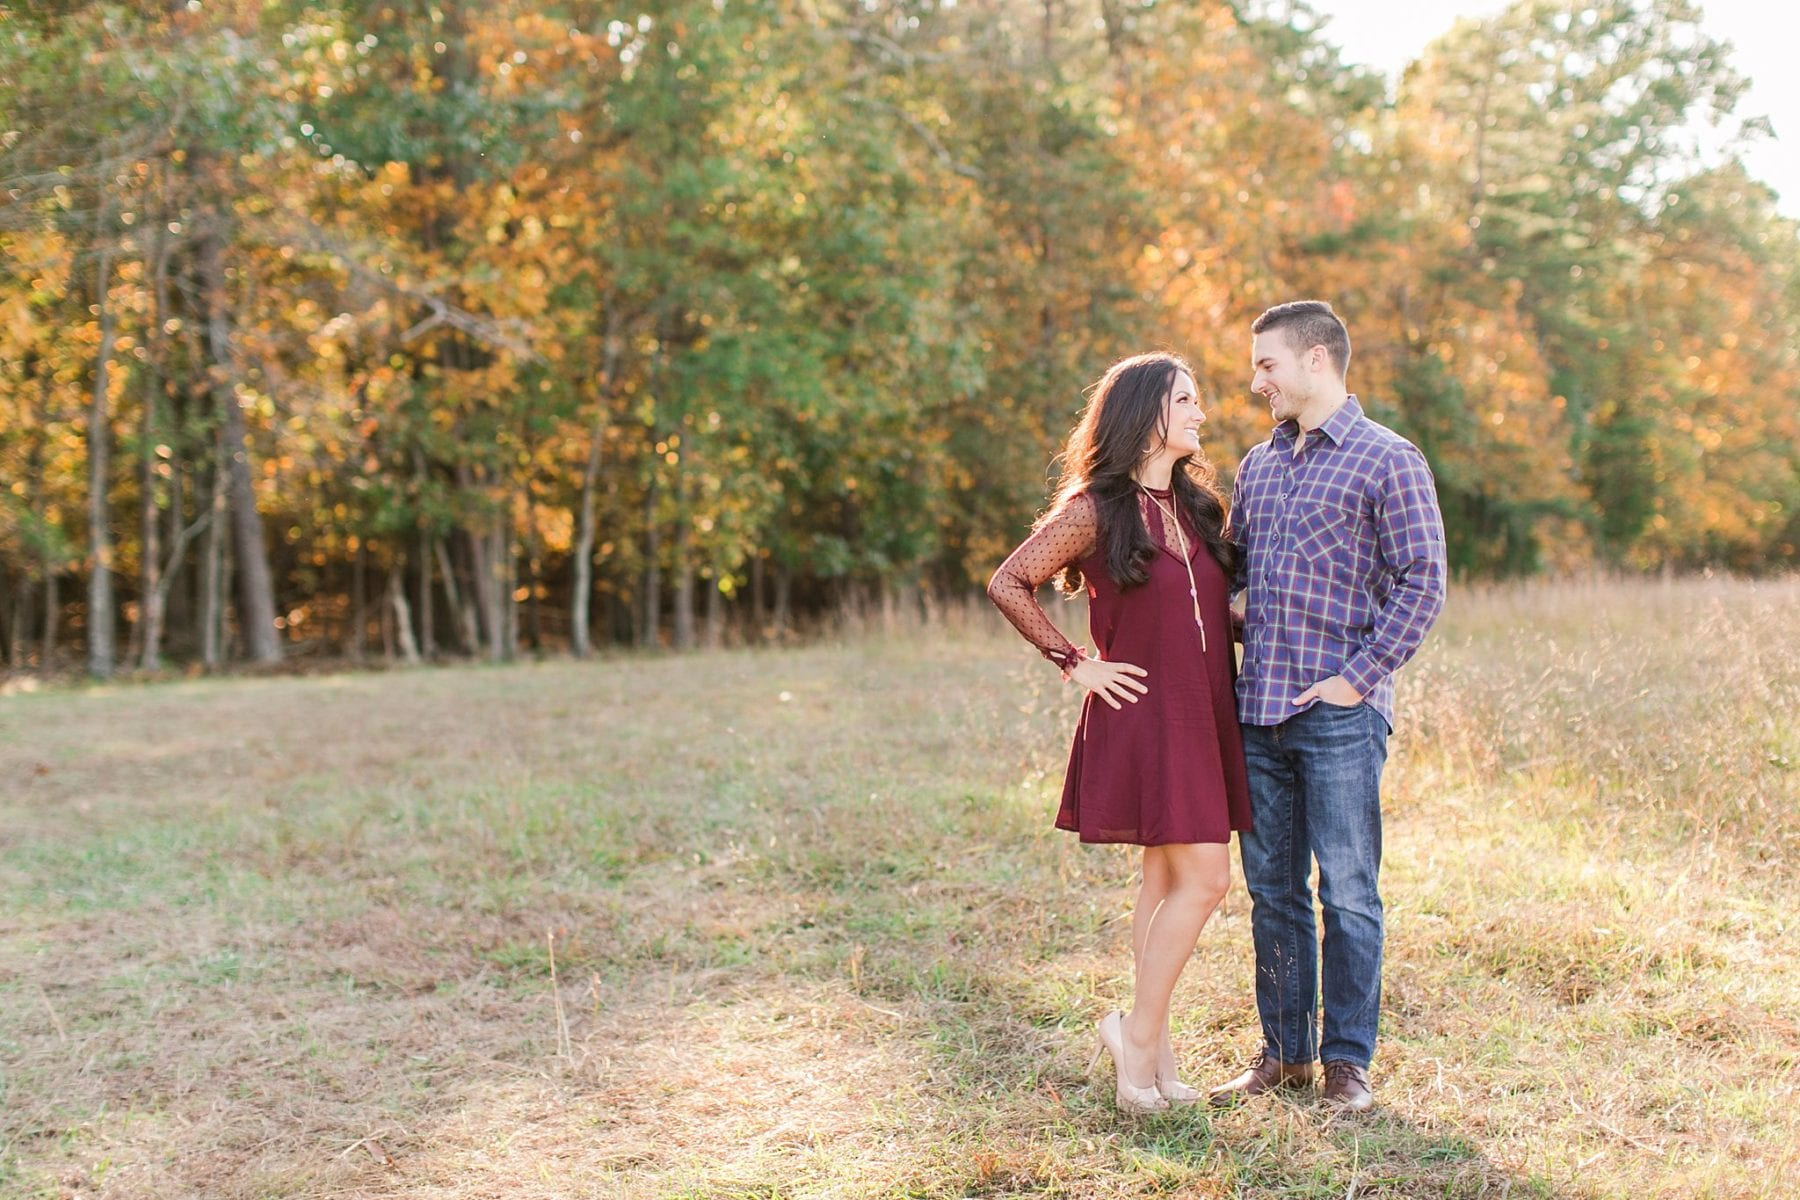 Manassas Battlefield Portraits Virginia Wedding Photographer Megan Kelsey Photography Lianne & Chris-2.jpg